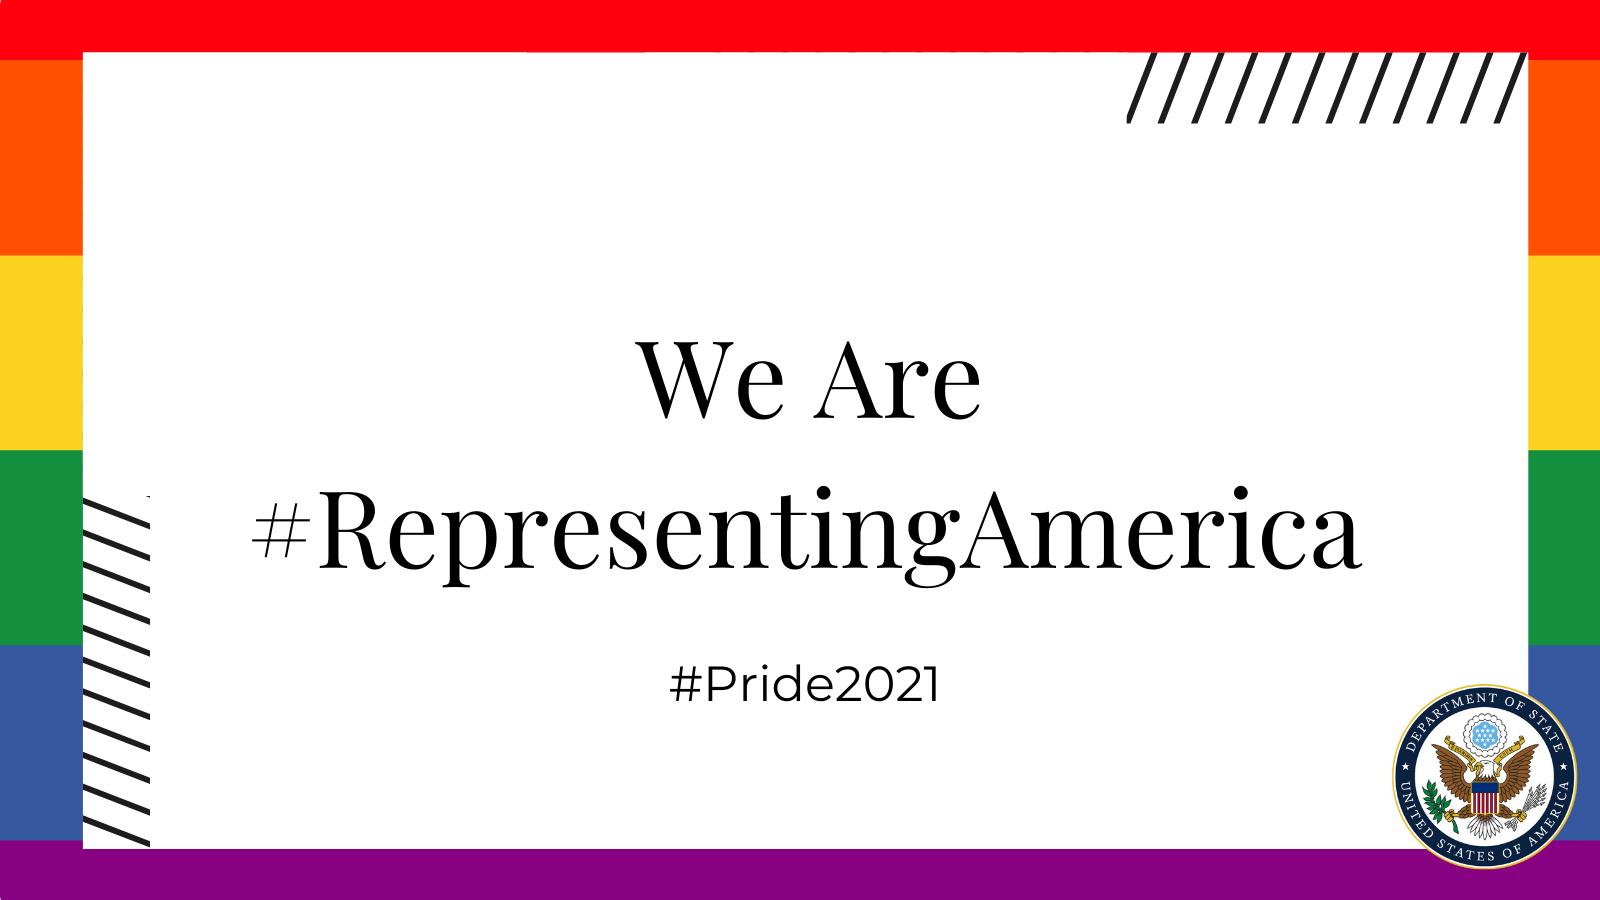 We Are #RepresentingAmerica #Pride2021